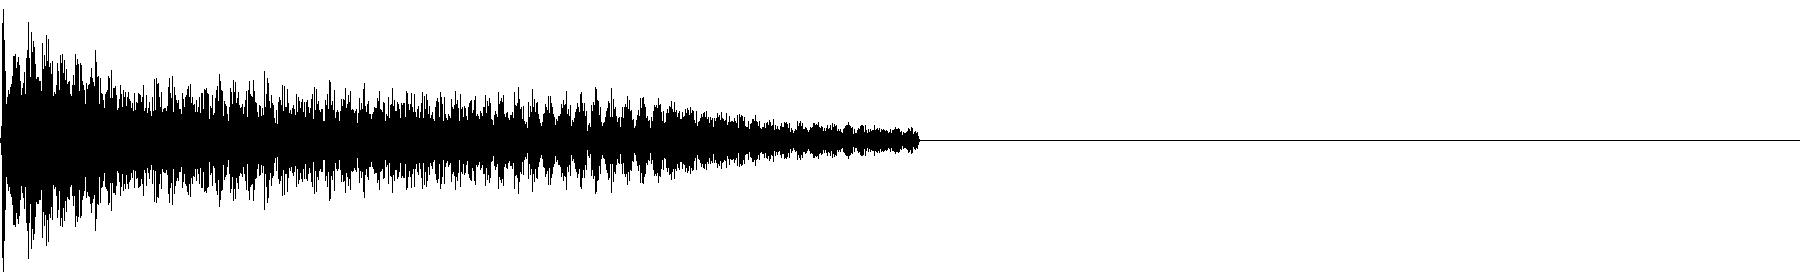 shg percussion 44